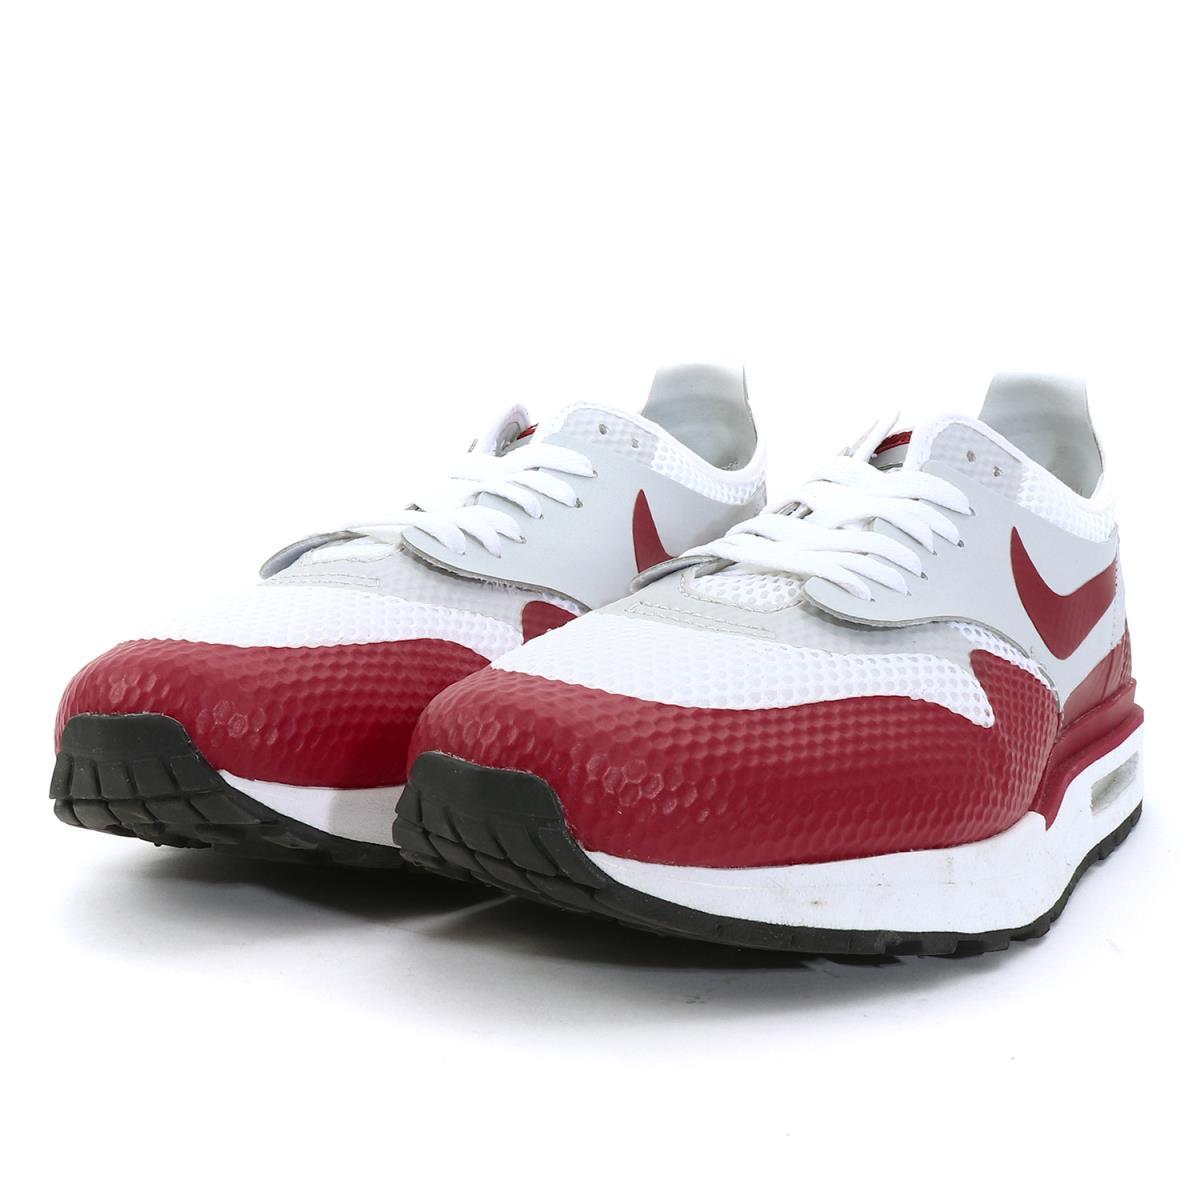 NIKE (Nike) AIR MAX 1 ROYAL SE SP (AA0869-100) white X gym red US10(28cm) 47f9efaee0c0